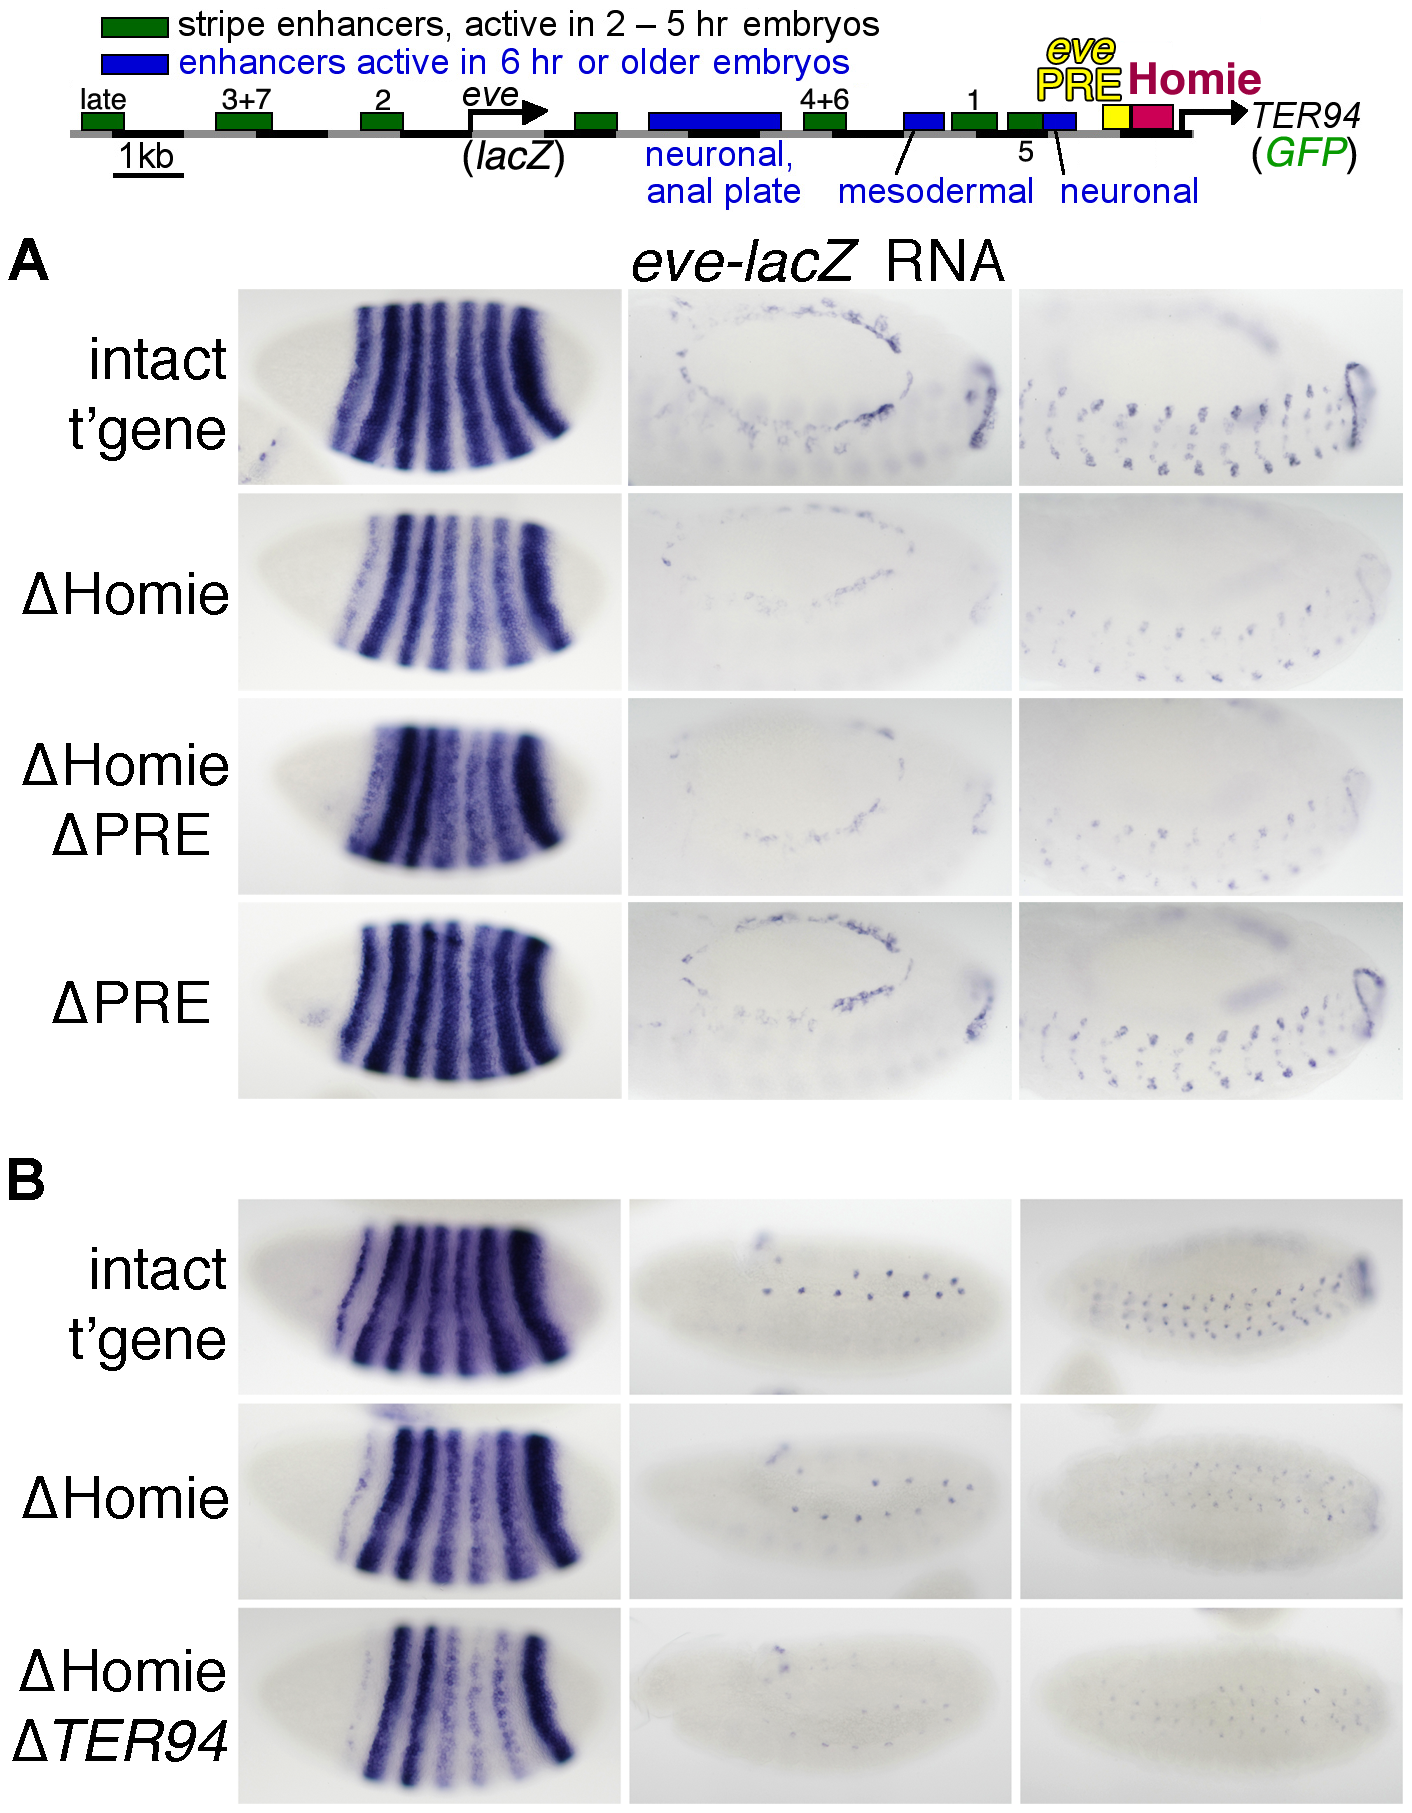 Homie facilitates <i>eve</i> 3′ enhancer action on the <i>eve</i> promoter through a mechanism that does not involve the <i>TER94</i> promoter.